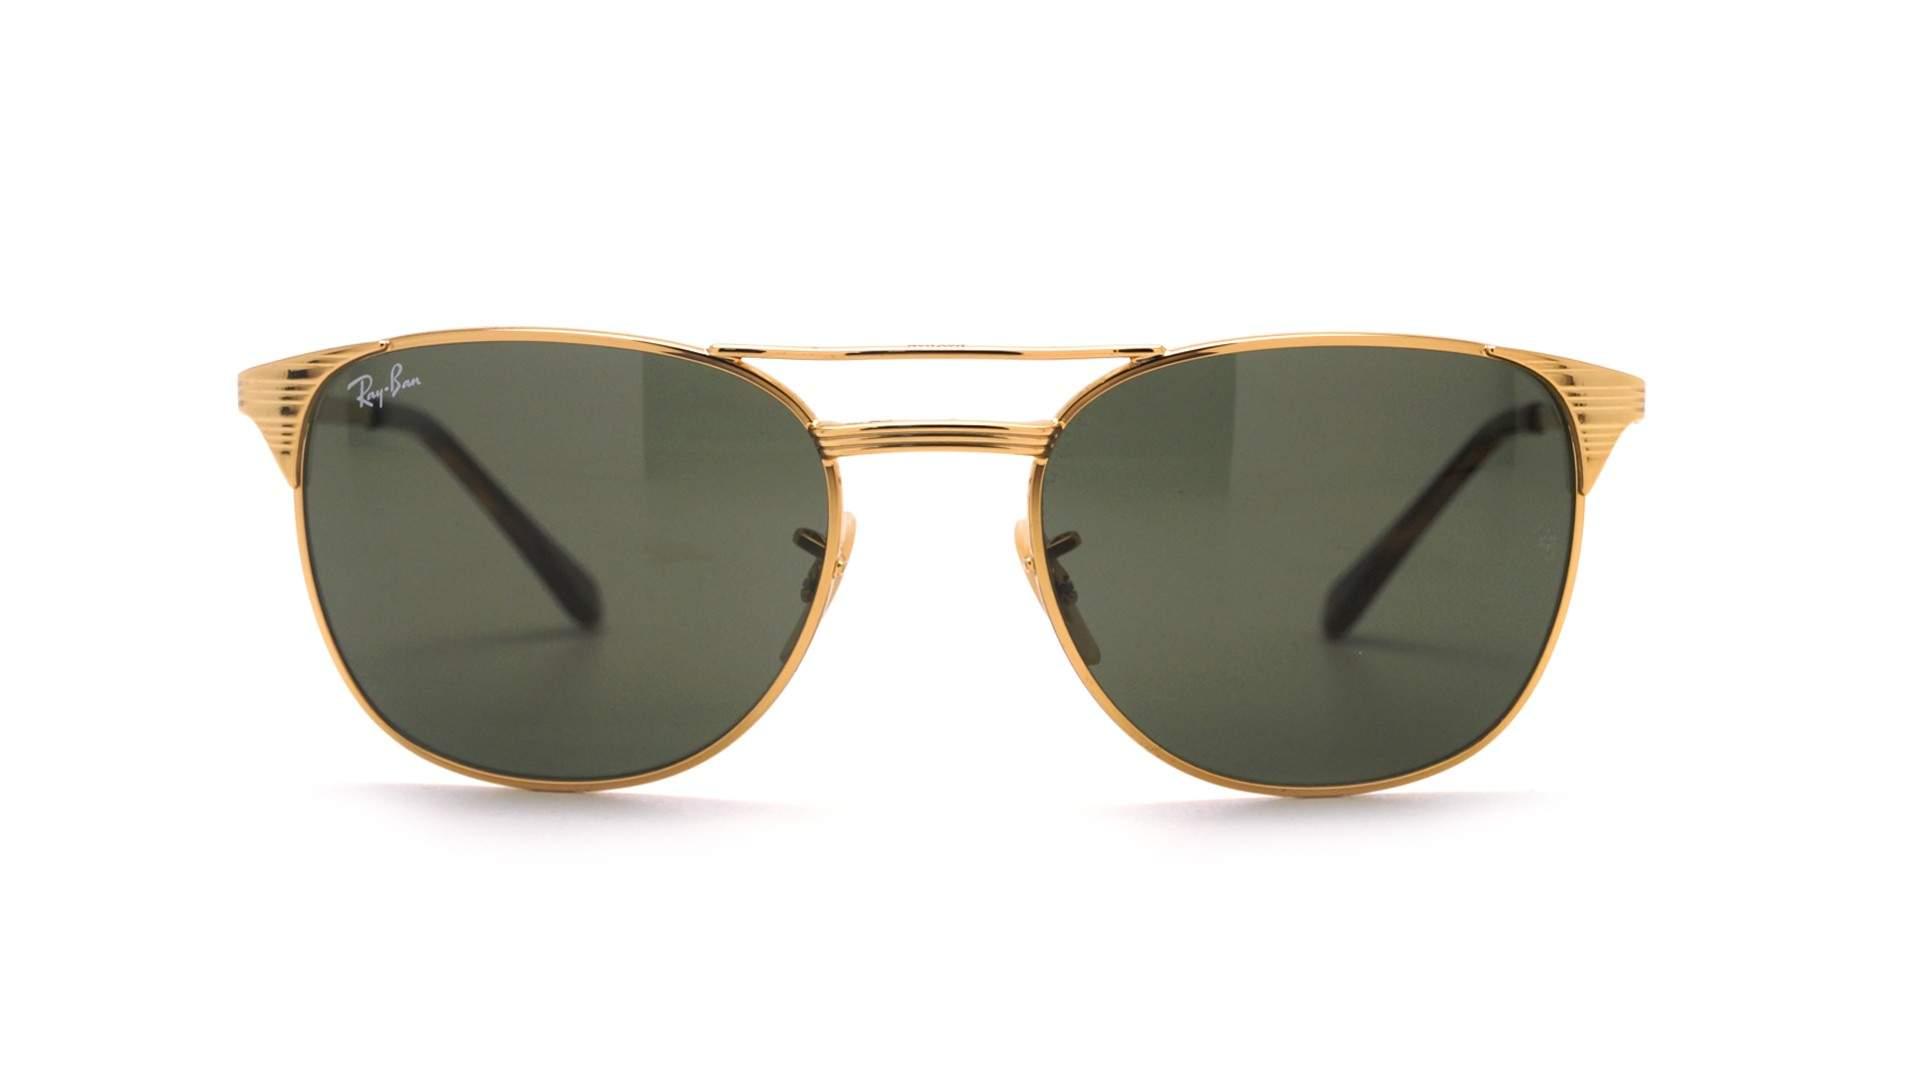 c361c76df5 Sunglasses Ray-Ban Signet Gold G-15 RB3429M 001 58-19 Large